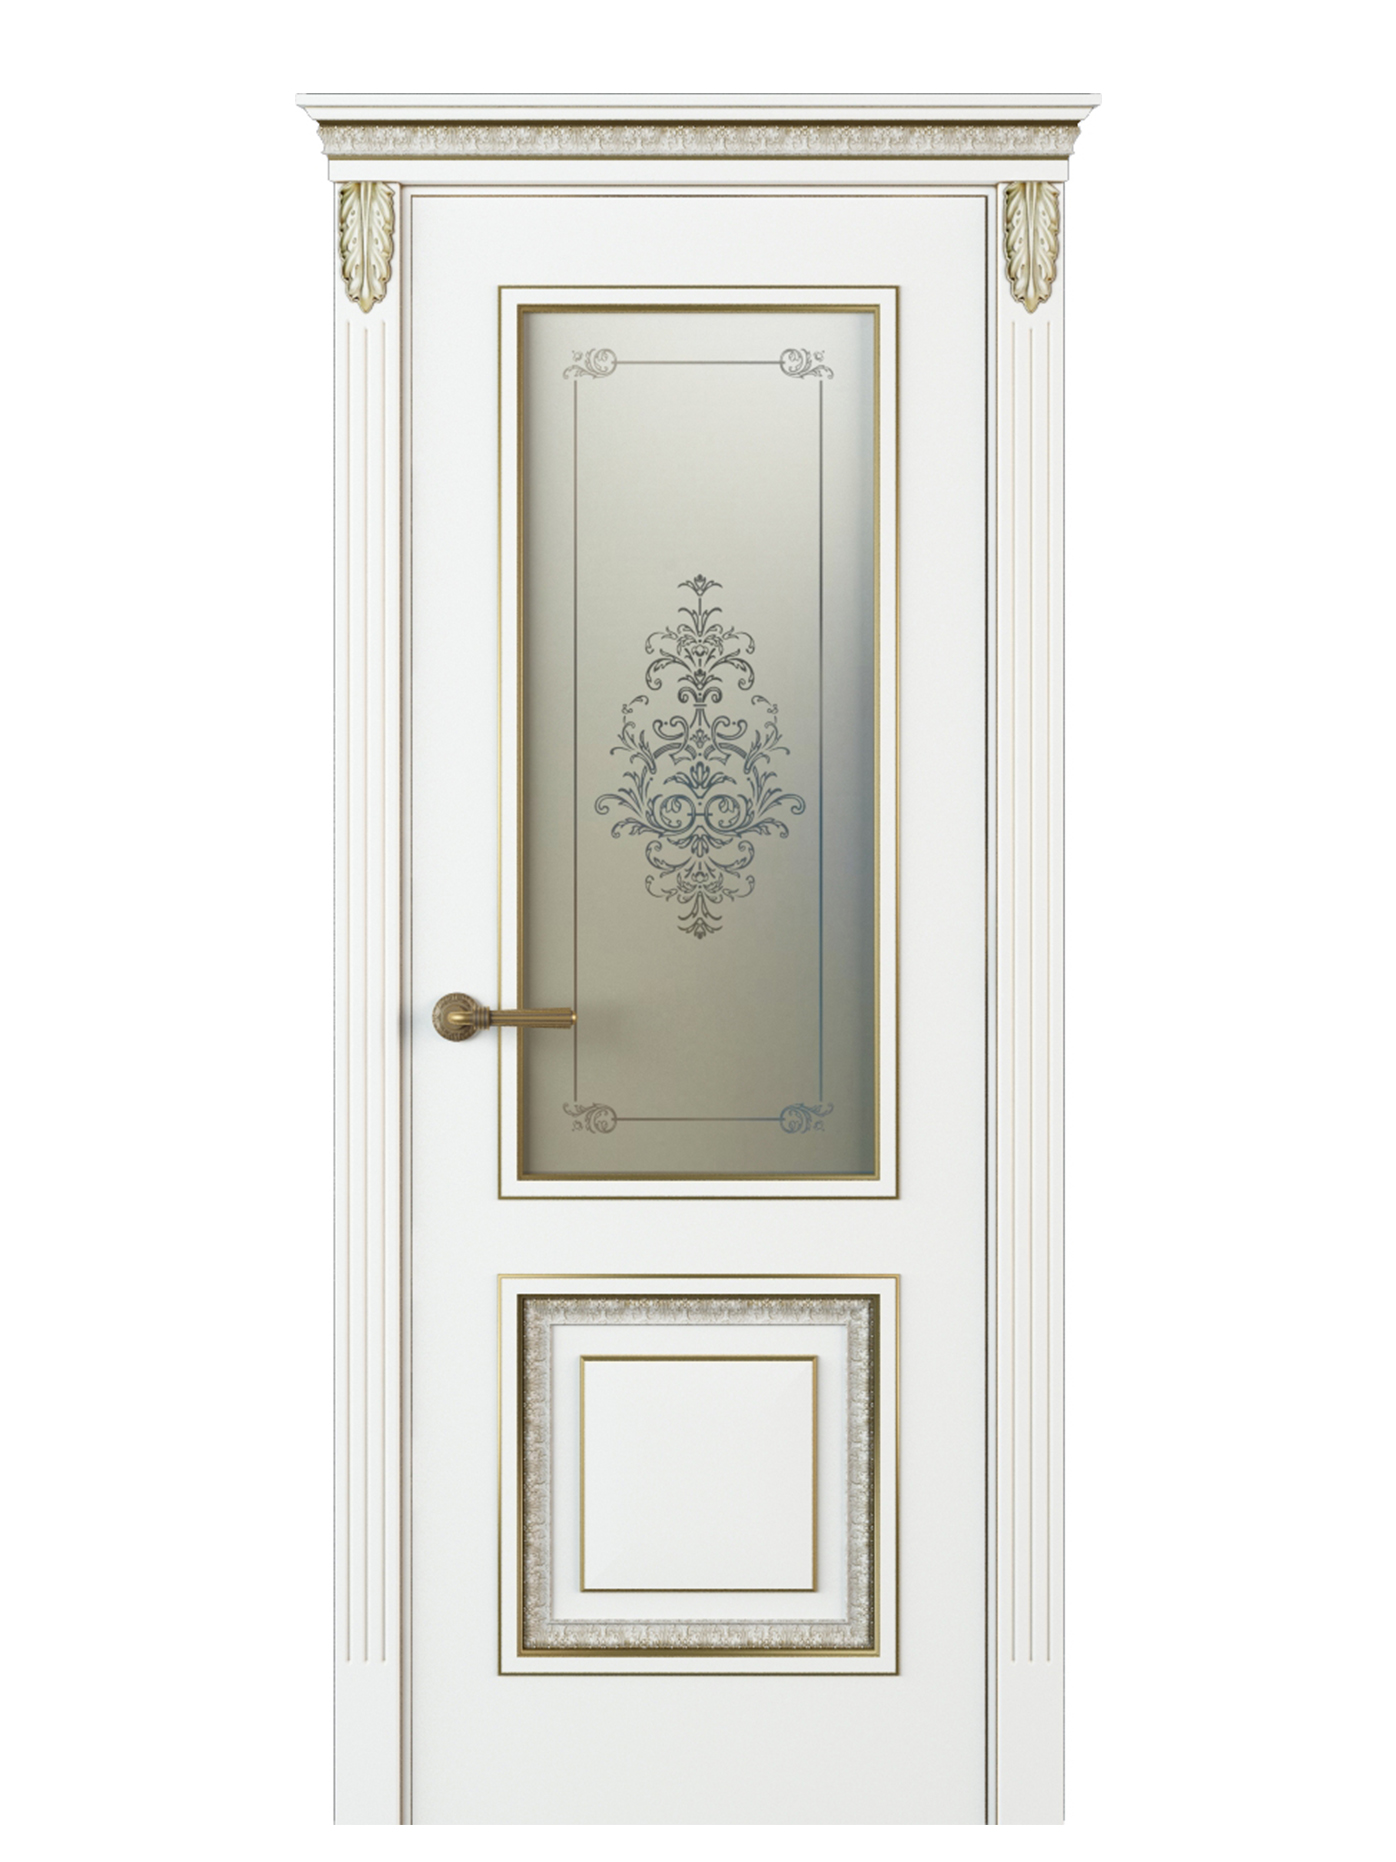 Image Molinella Vetro Interior Door Italian Enamel White 0